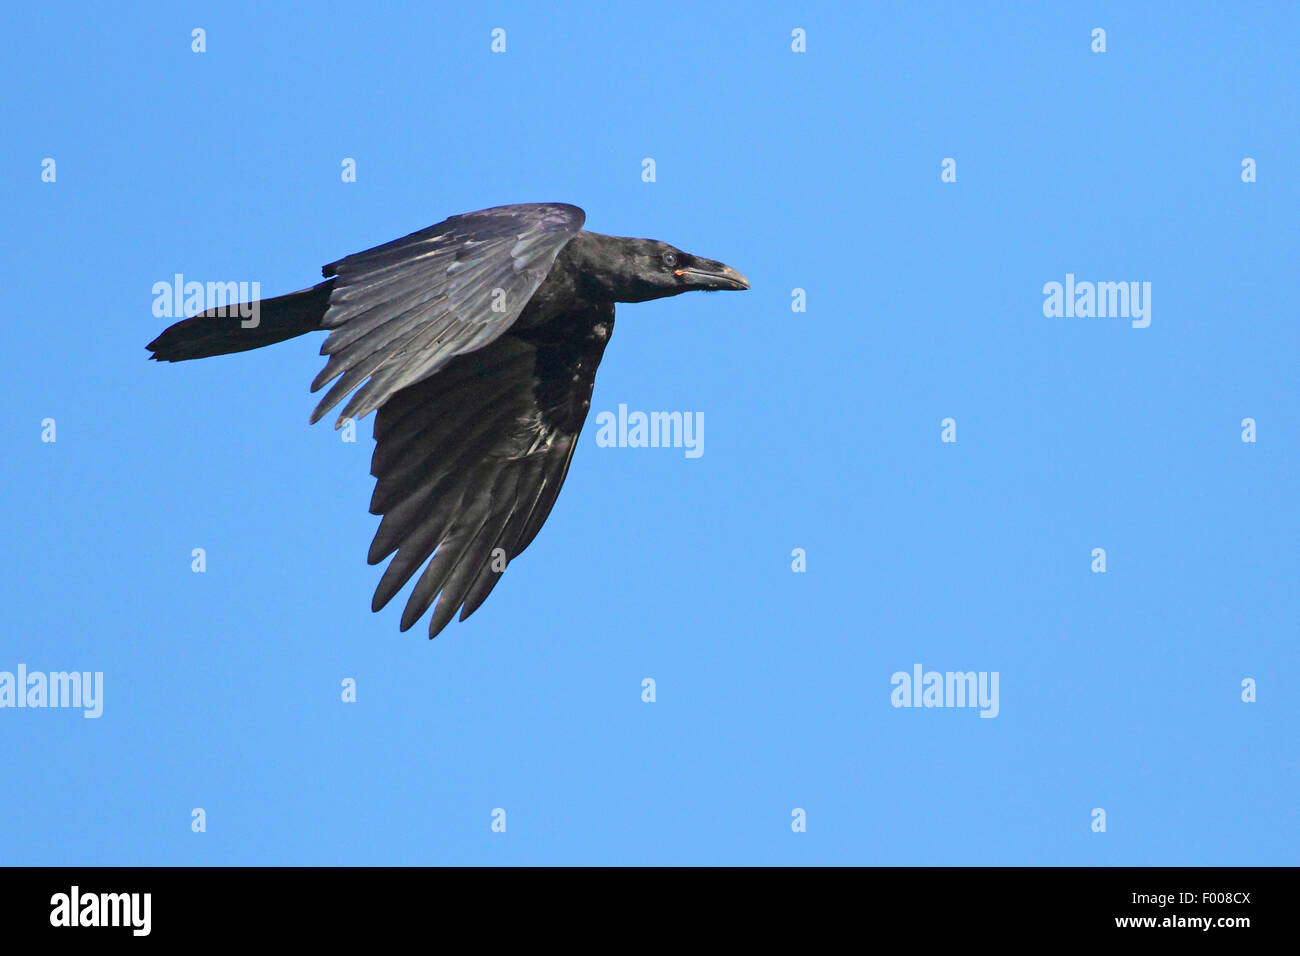 common raven (Corvus corax), in flight, Germany - Stock Image